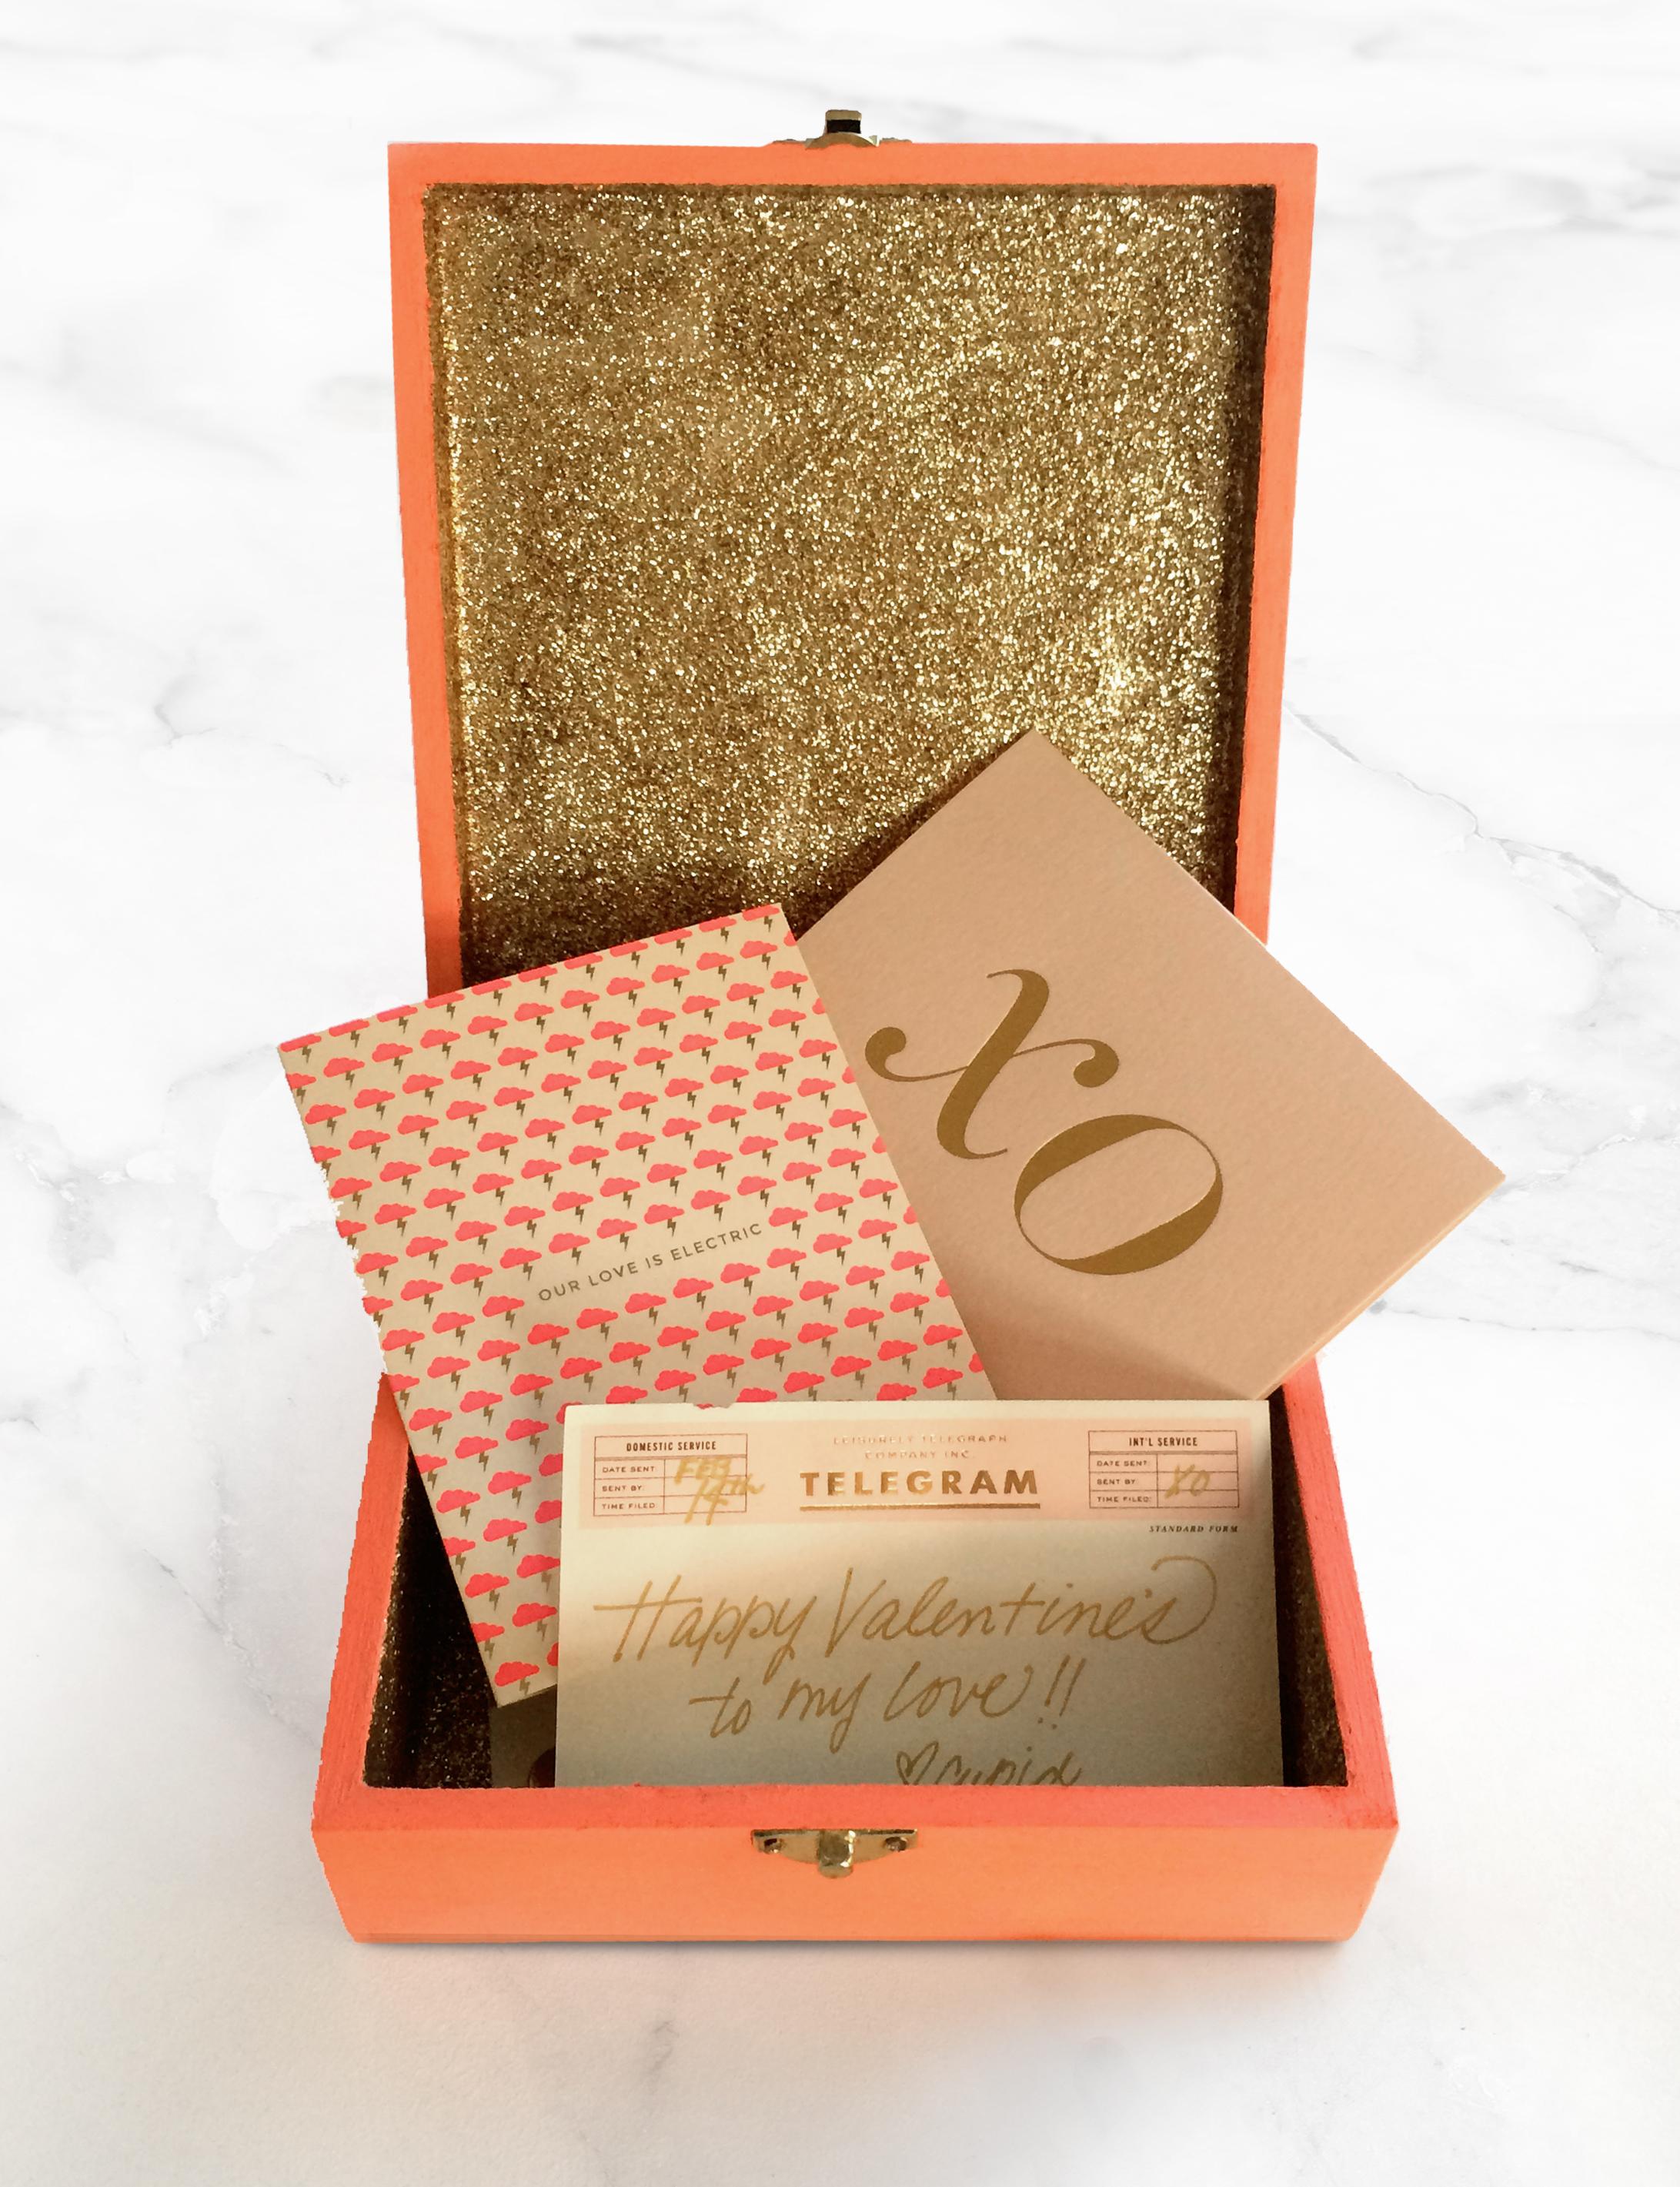 DIY Magnetic Tic-Tac-Toe Gold & Coral Box   Valentine's Day XOXO   Sugar & Gold